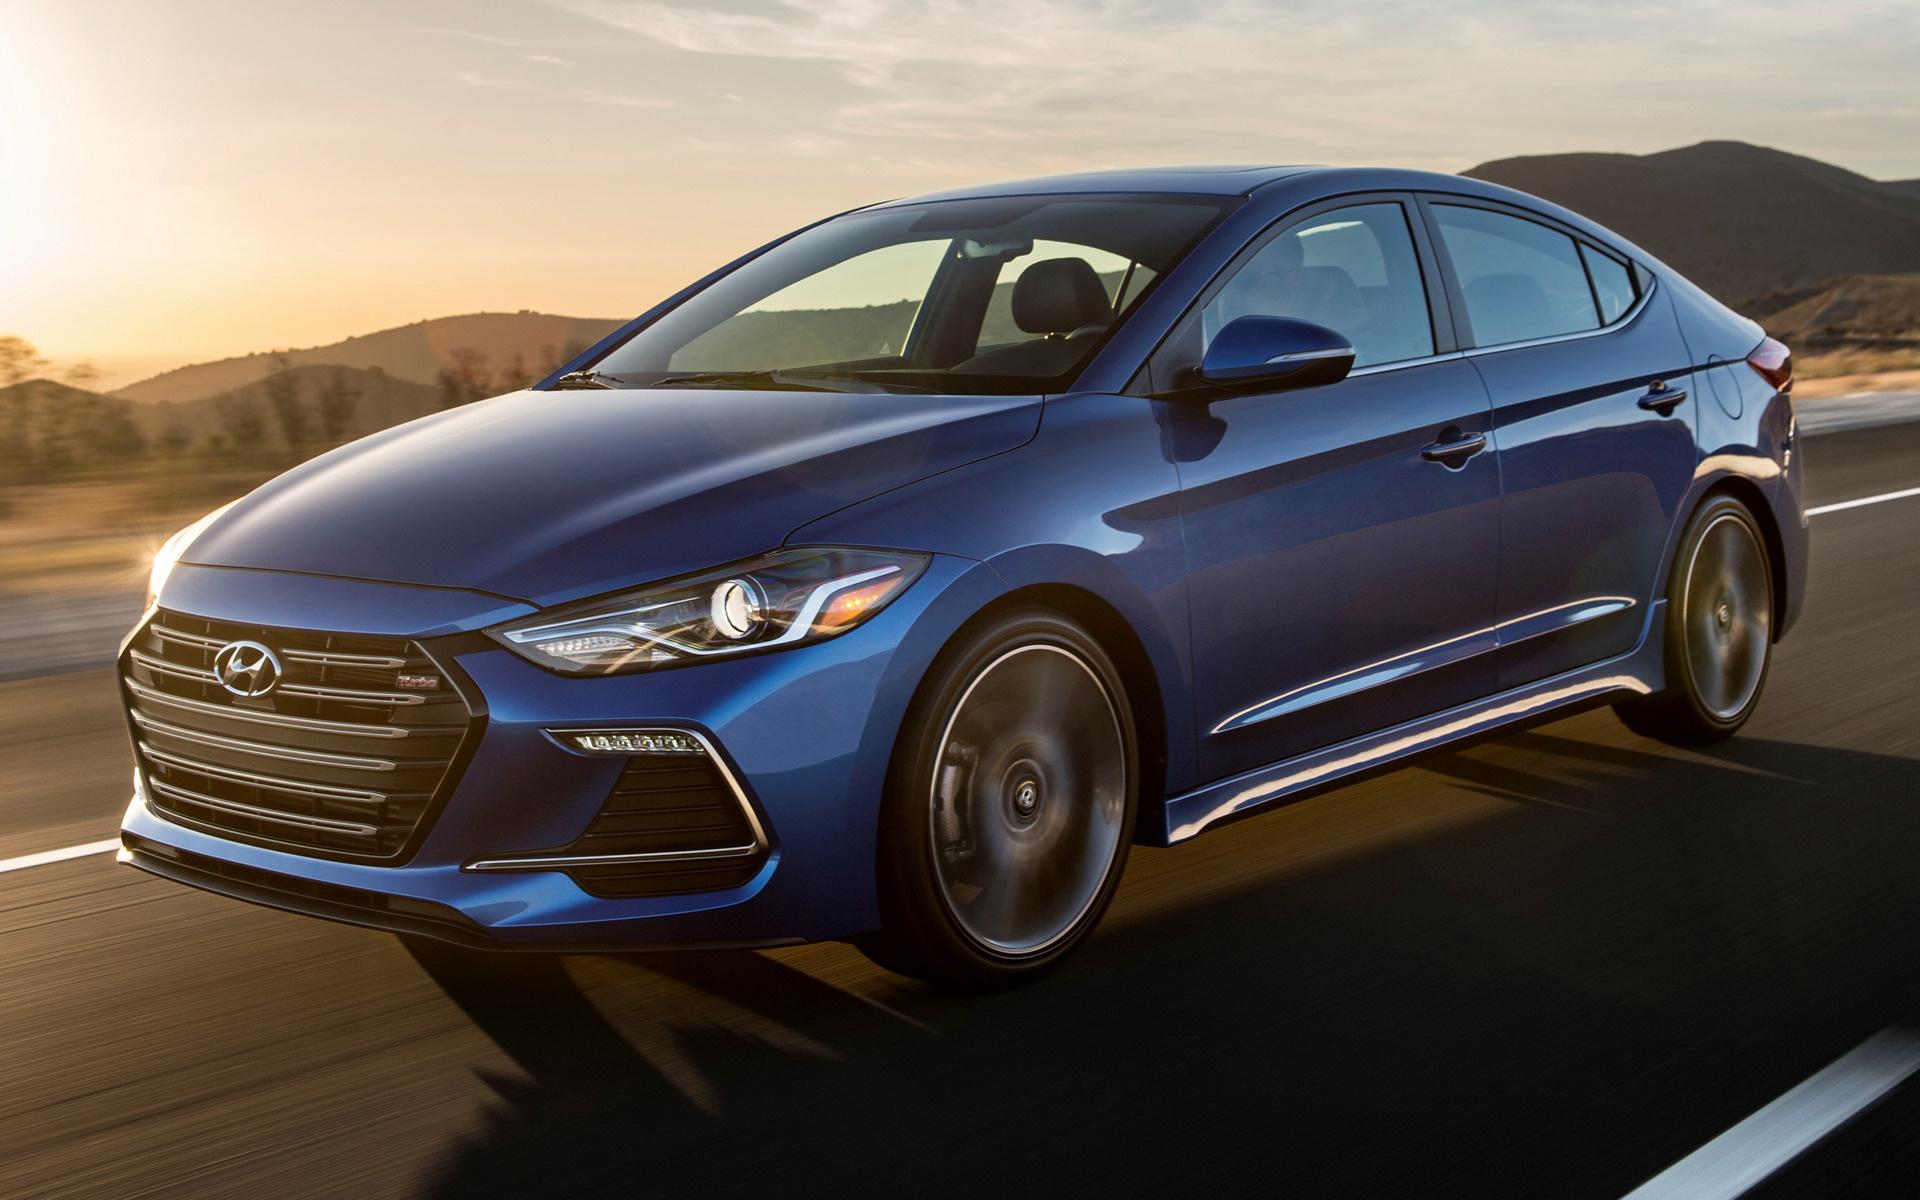 2017 Hyundai Elantra Limited >> Hyundai Elantra Sport (2017) US Wallpapers and HD Images - Car Pixel